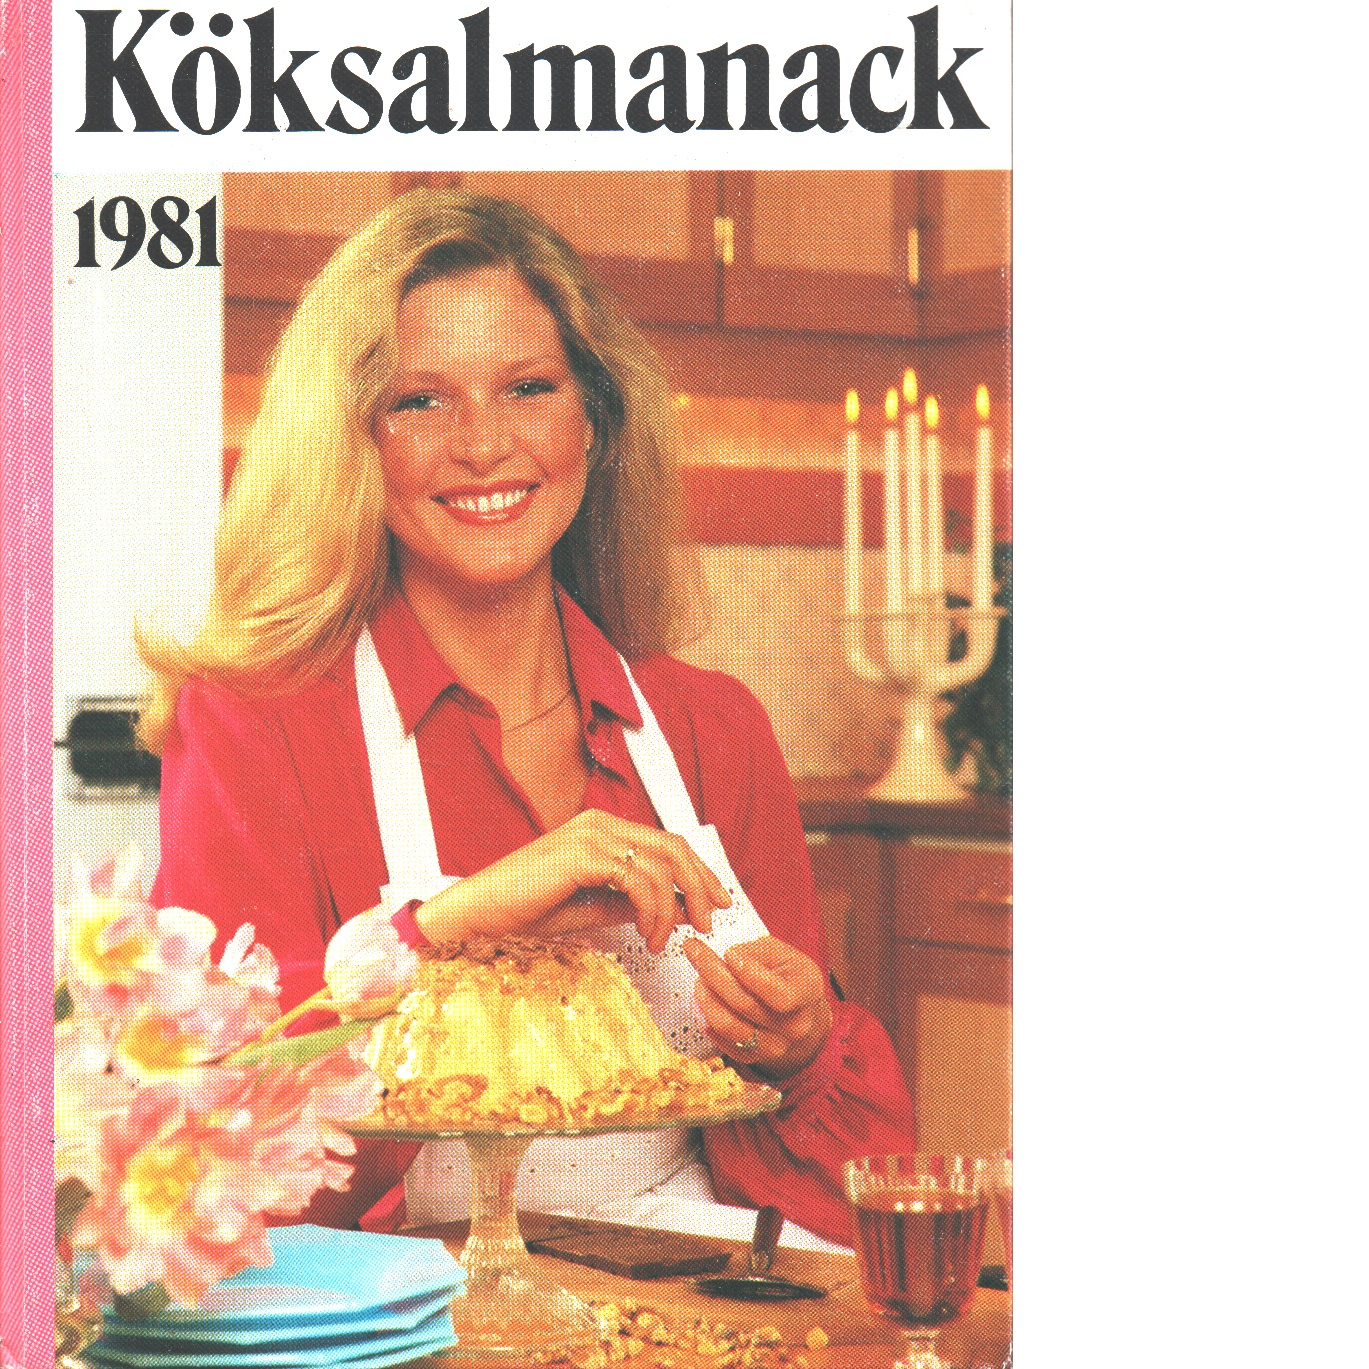 Köksalmanack 1981 - Red.